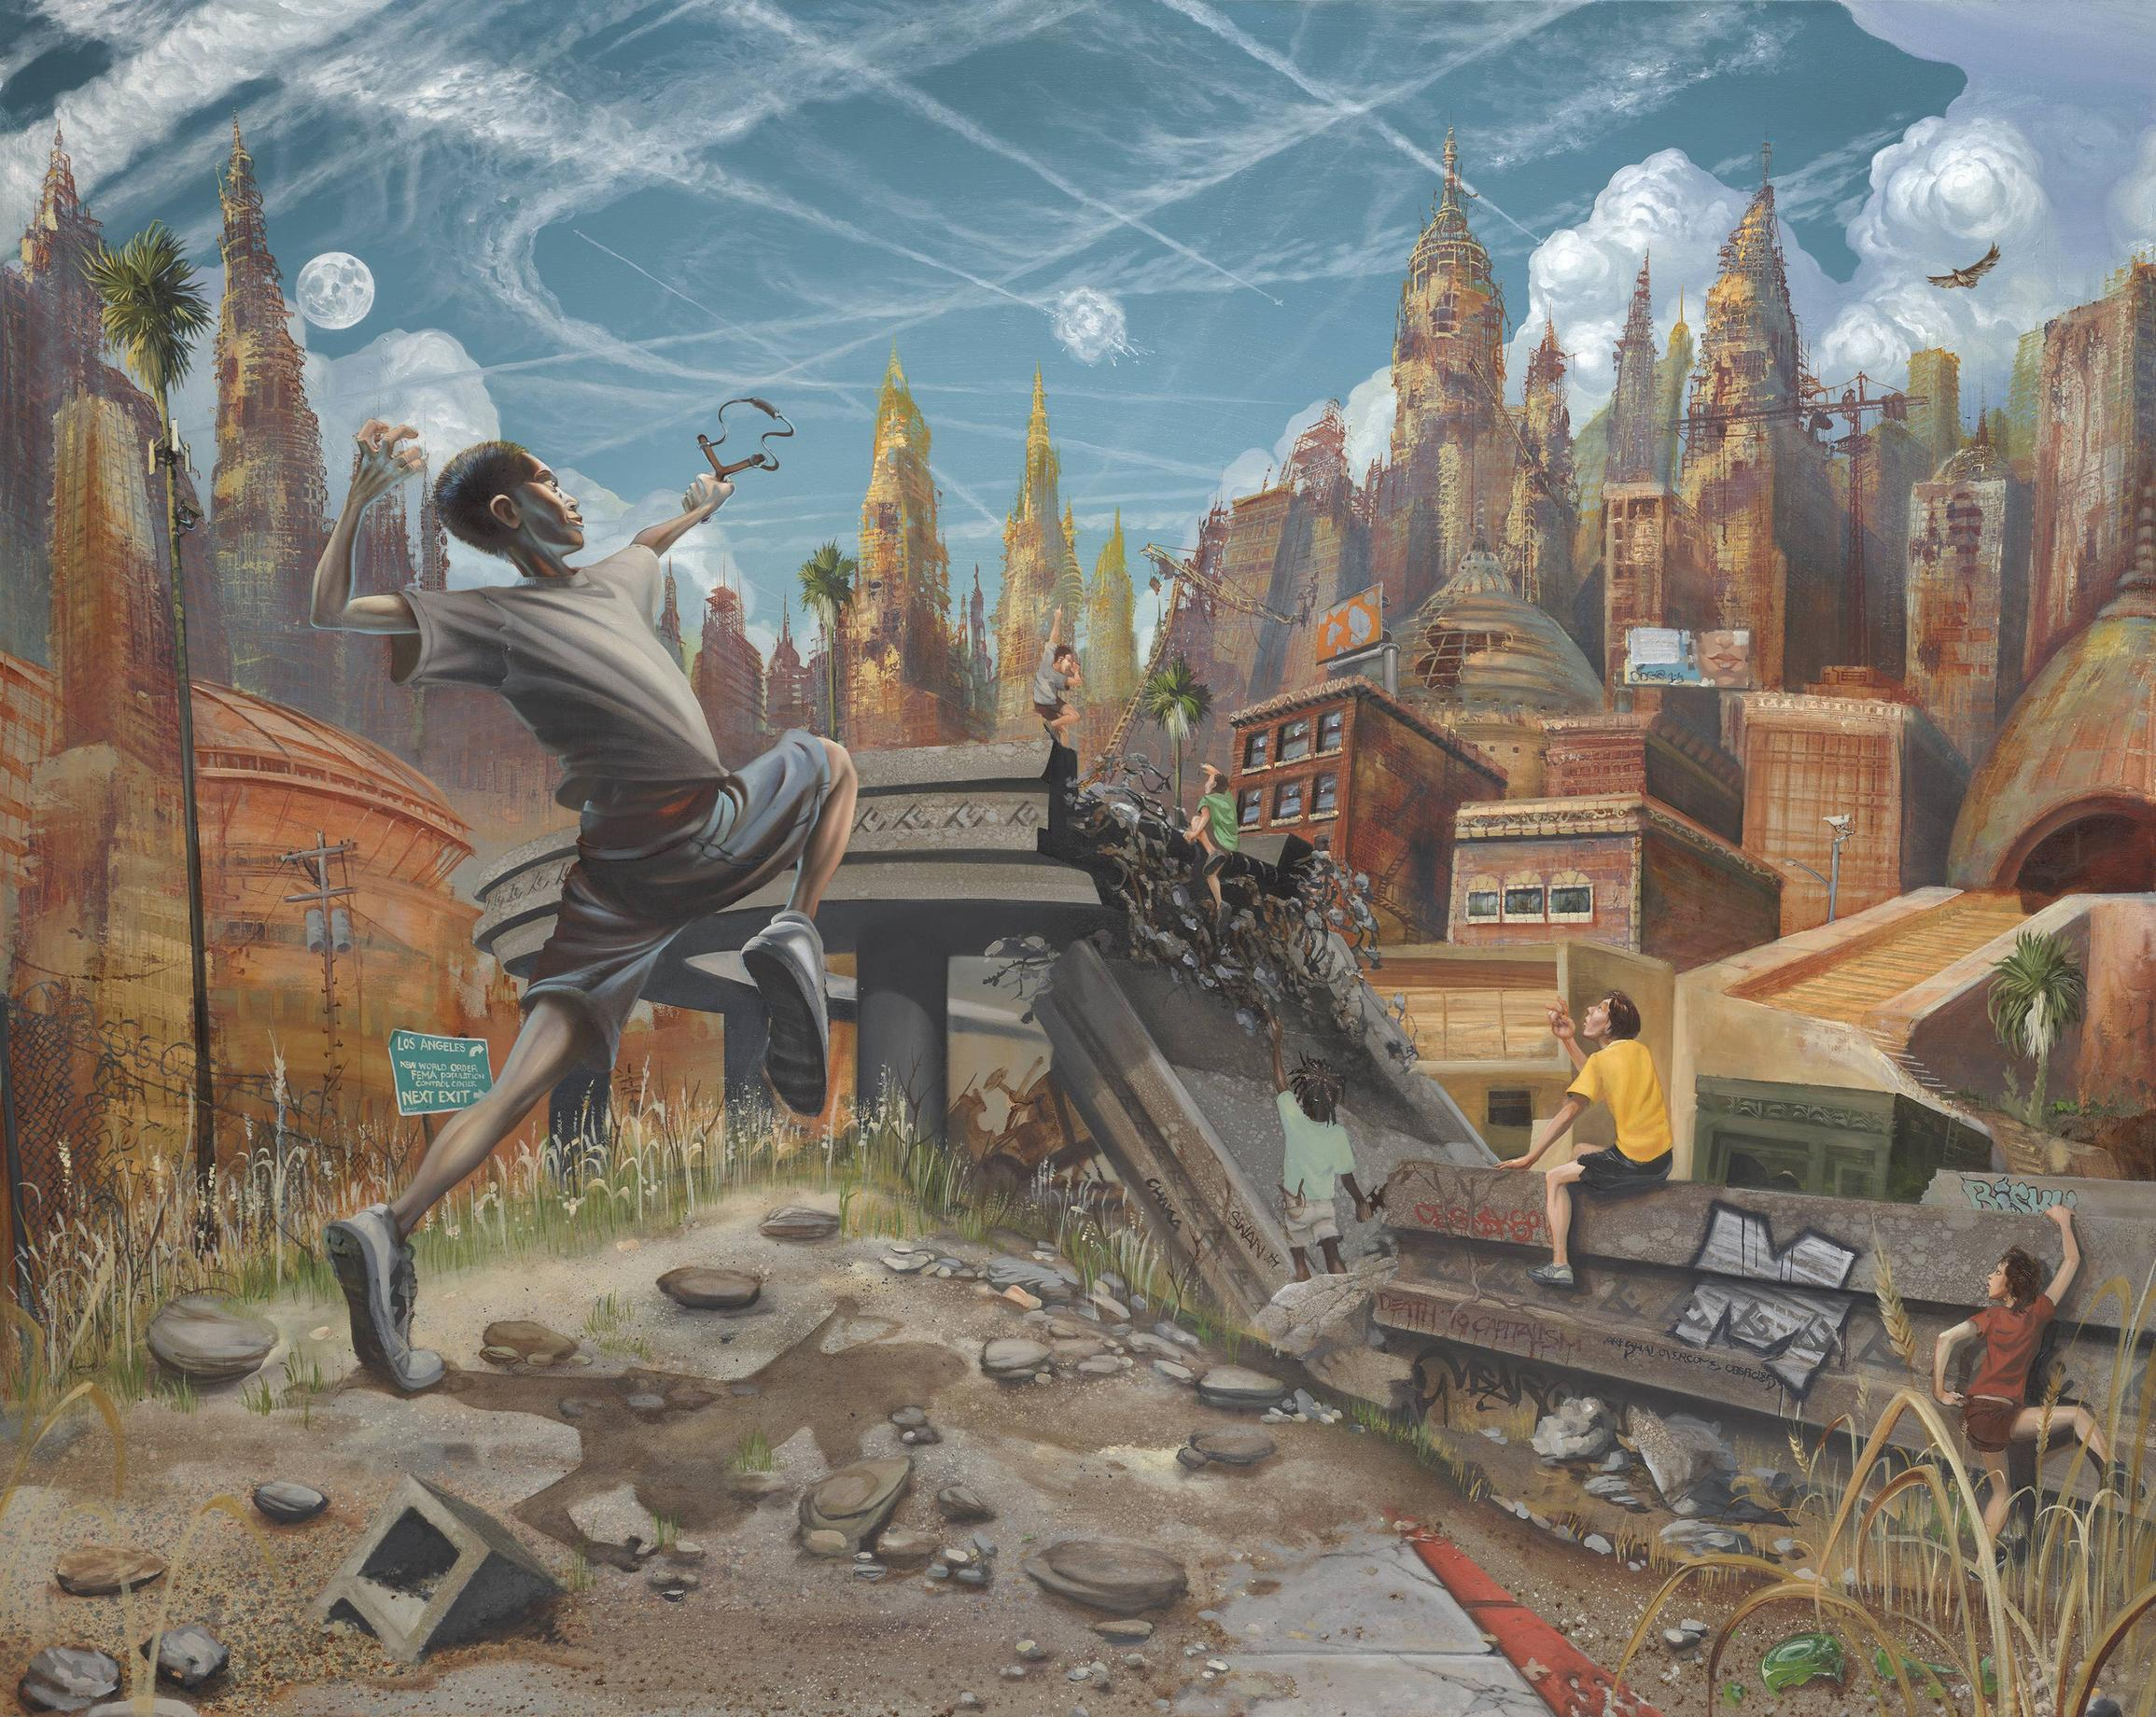 Freeport - David & Goliath 25/100